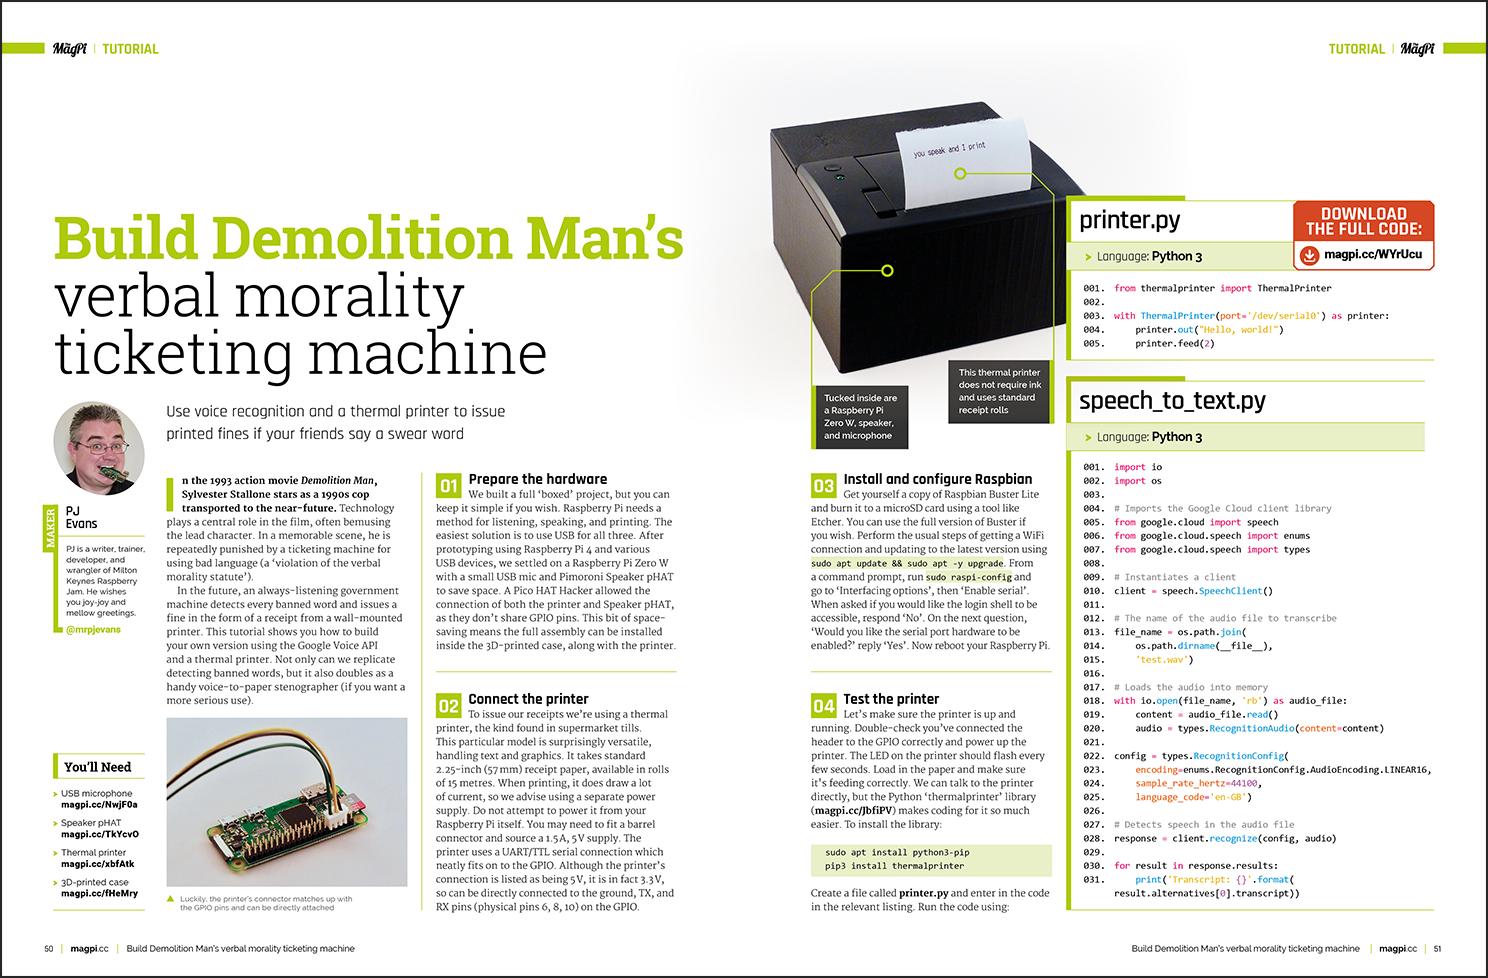 Demolition Man tutorial - The MagPi MagazineThe MagPi Magazine